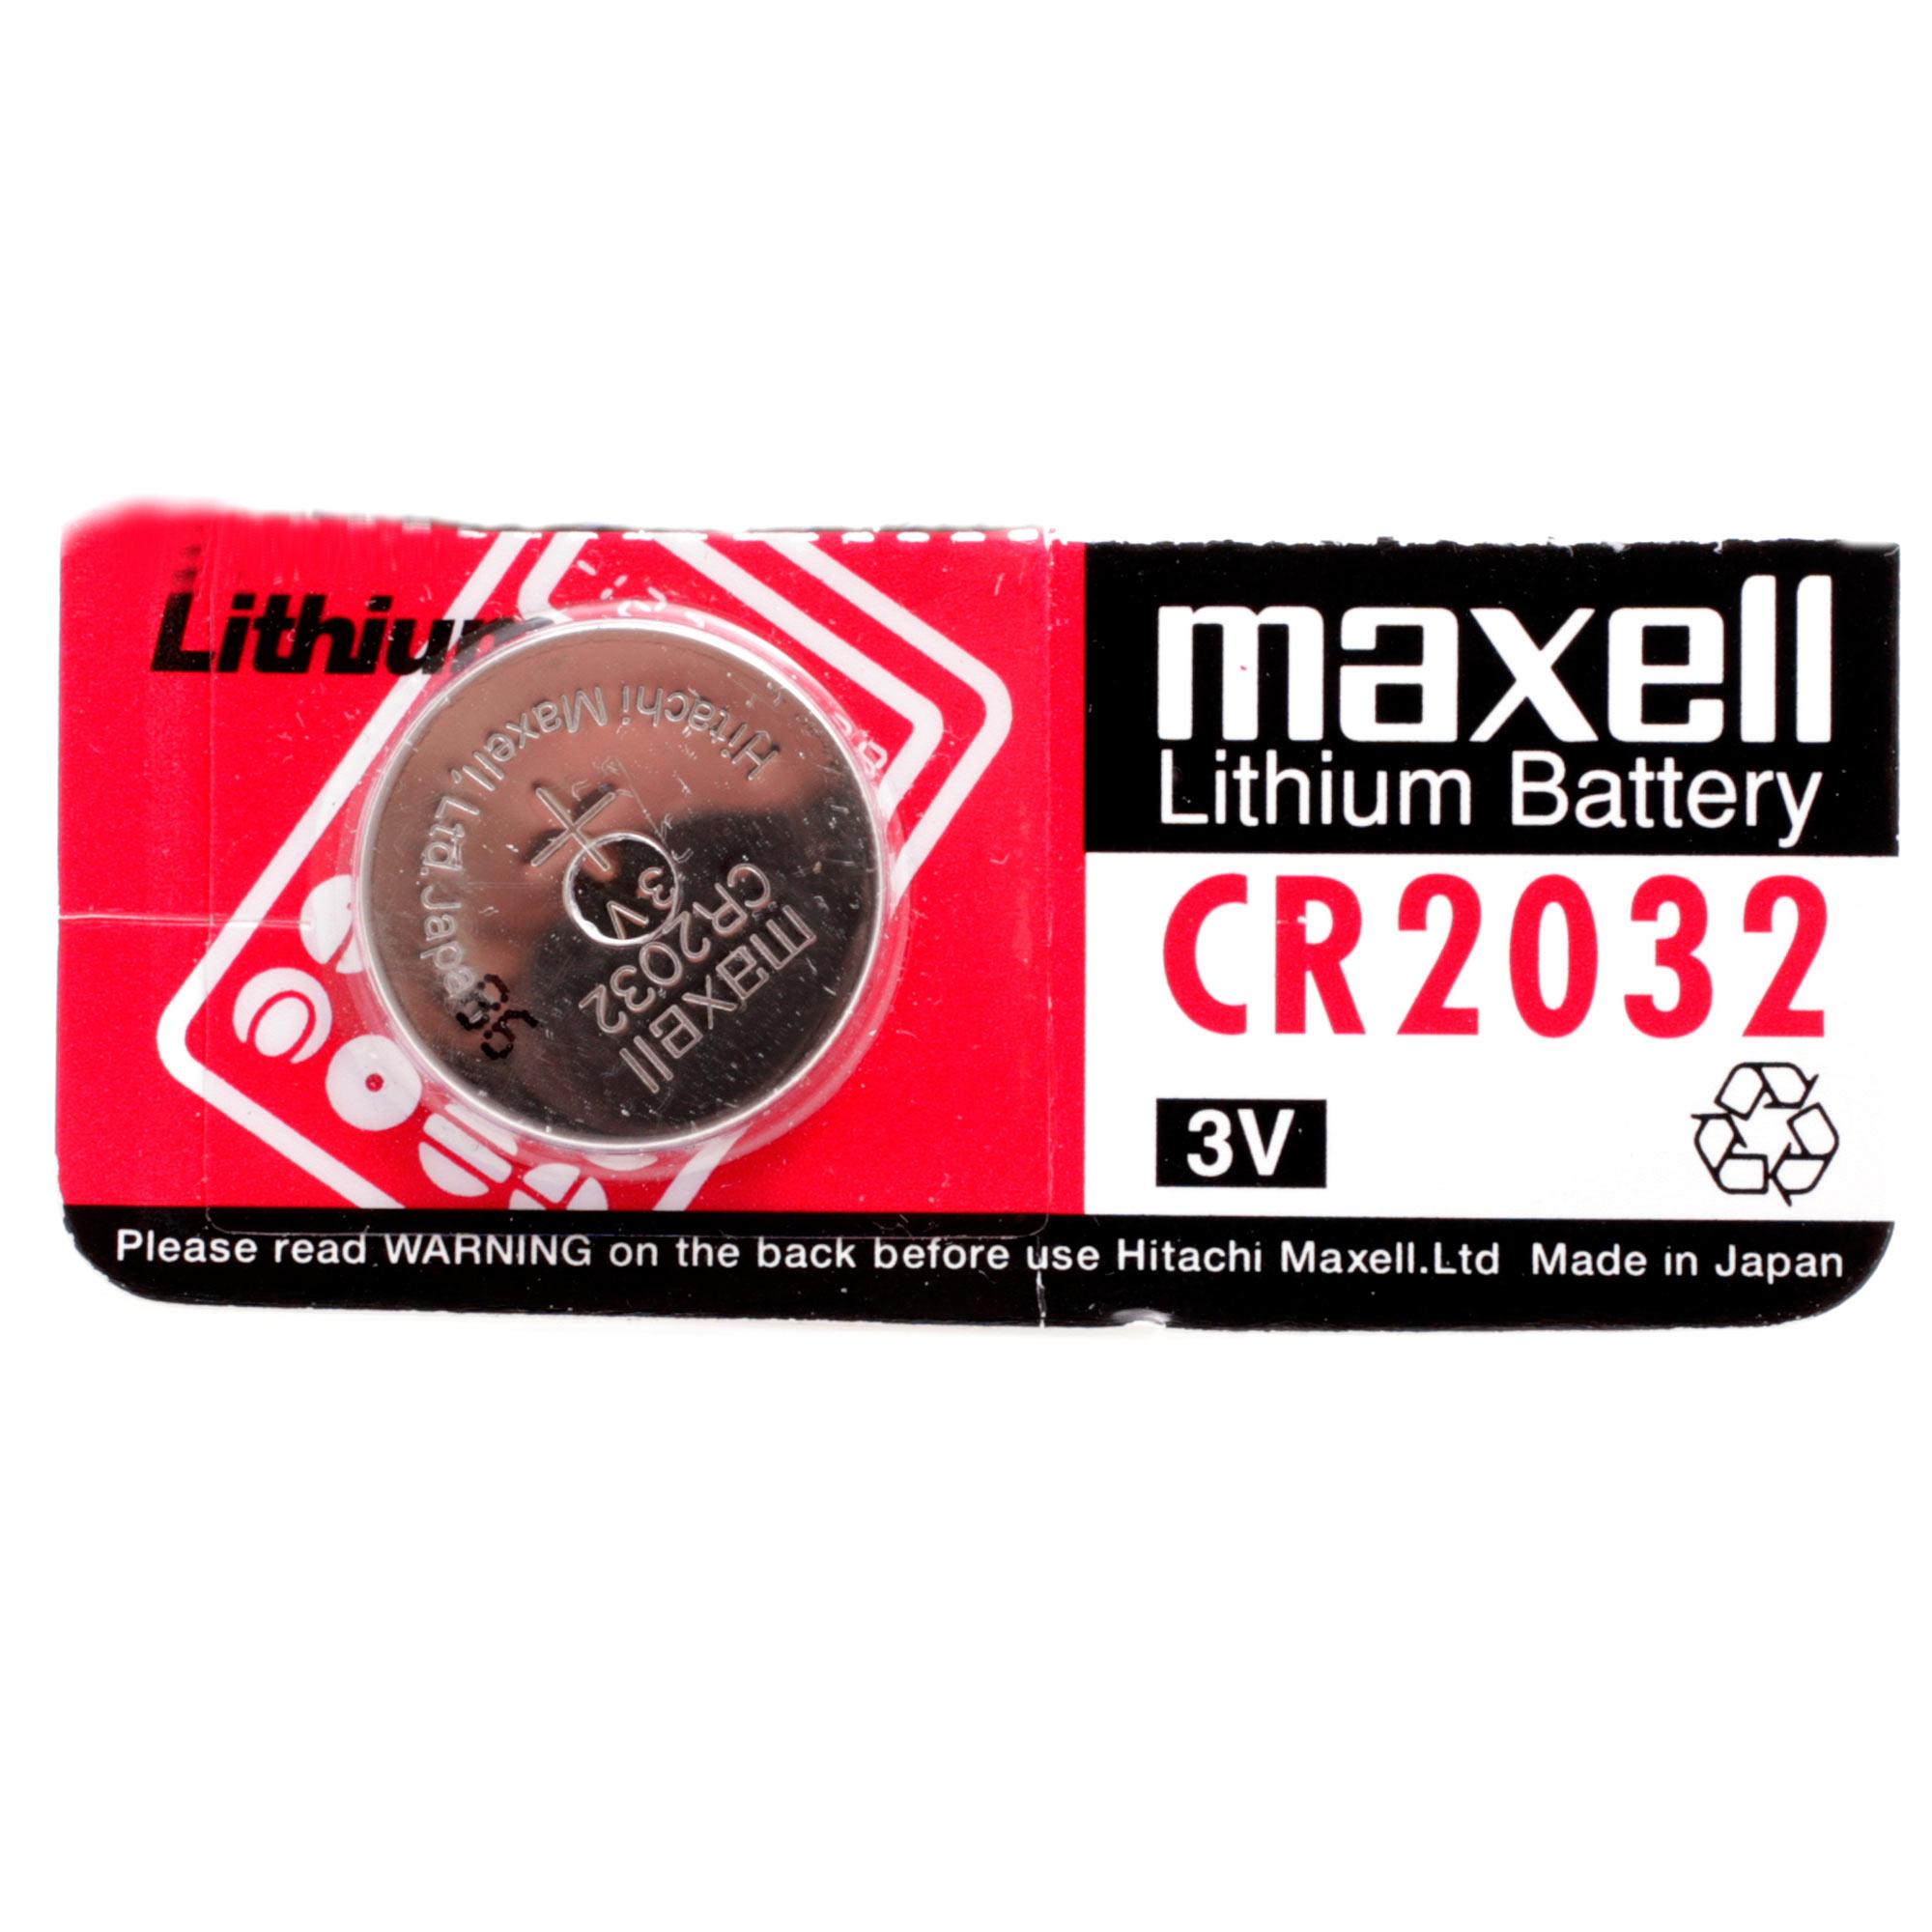 maxell cr2032 3v cmos motherboard battery rapid pcs. Black Bedroom Furniture Sets. Home Design Ideas